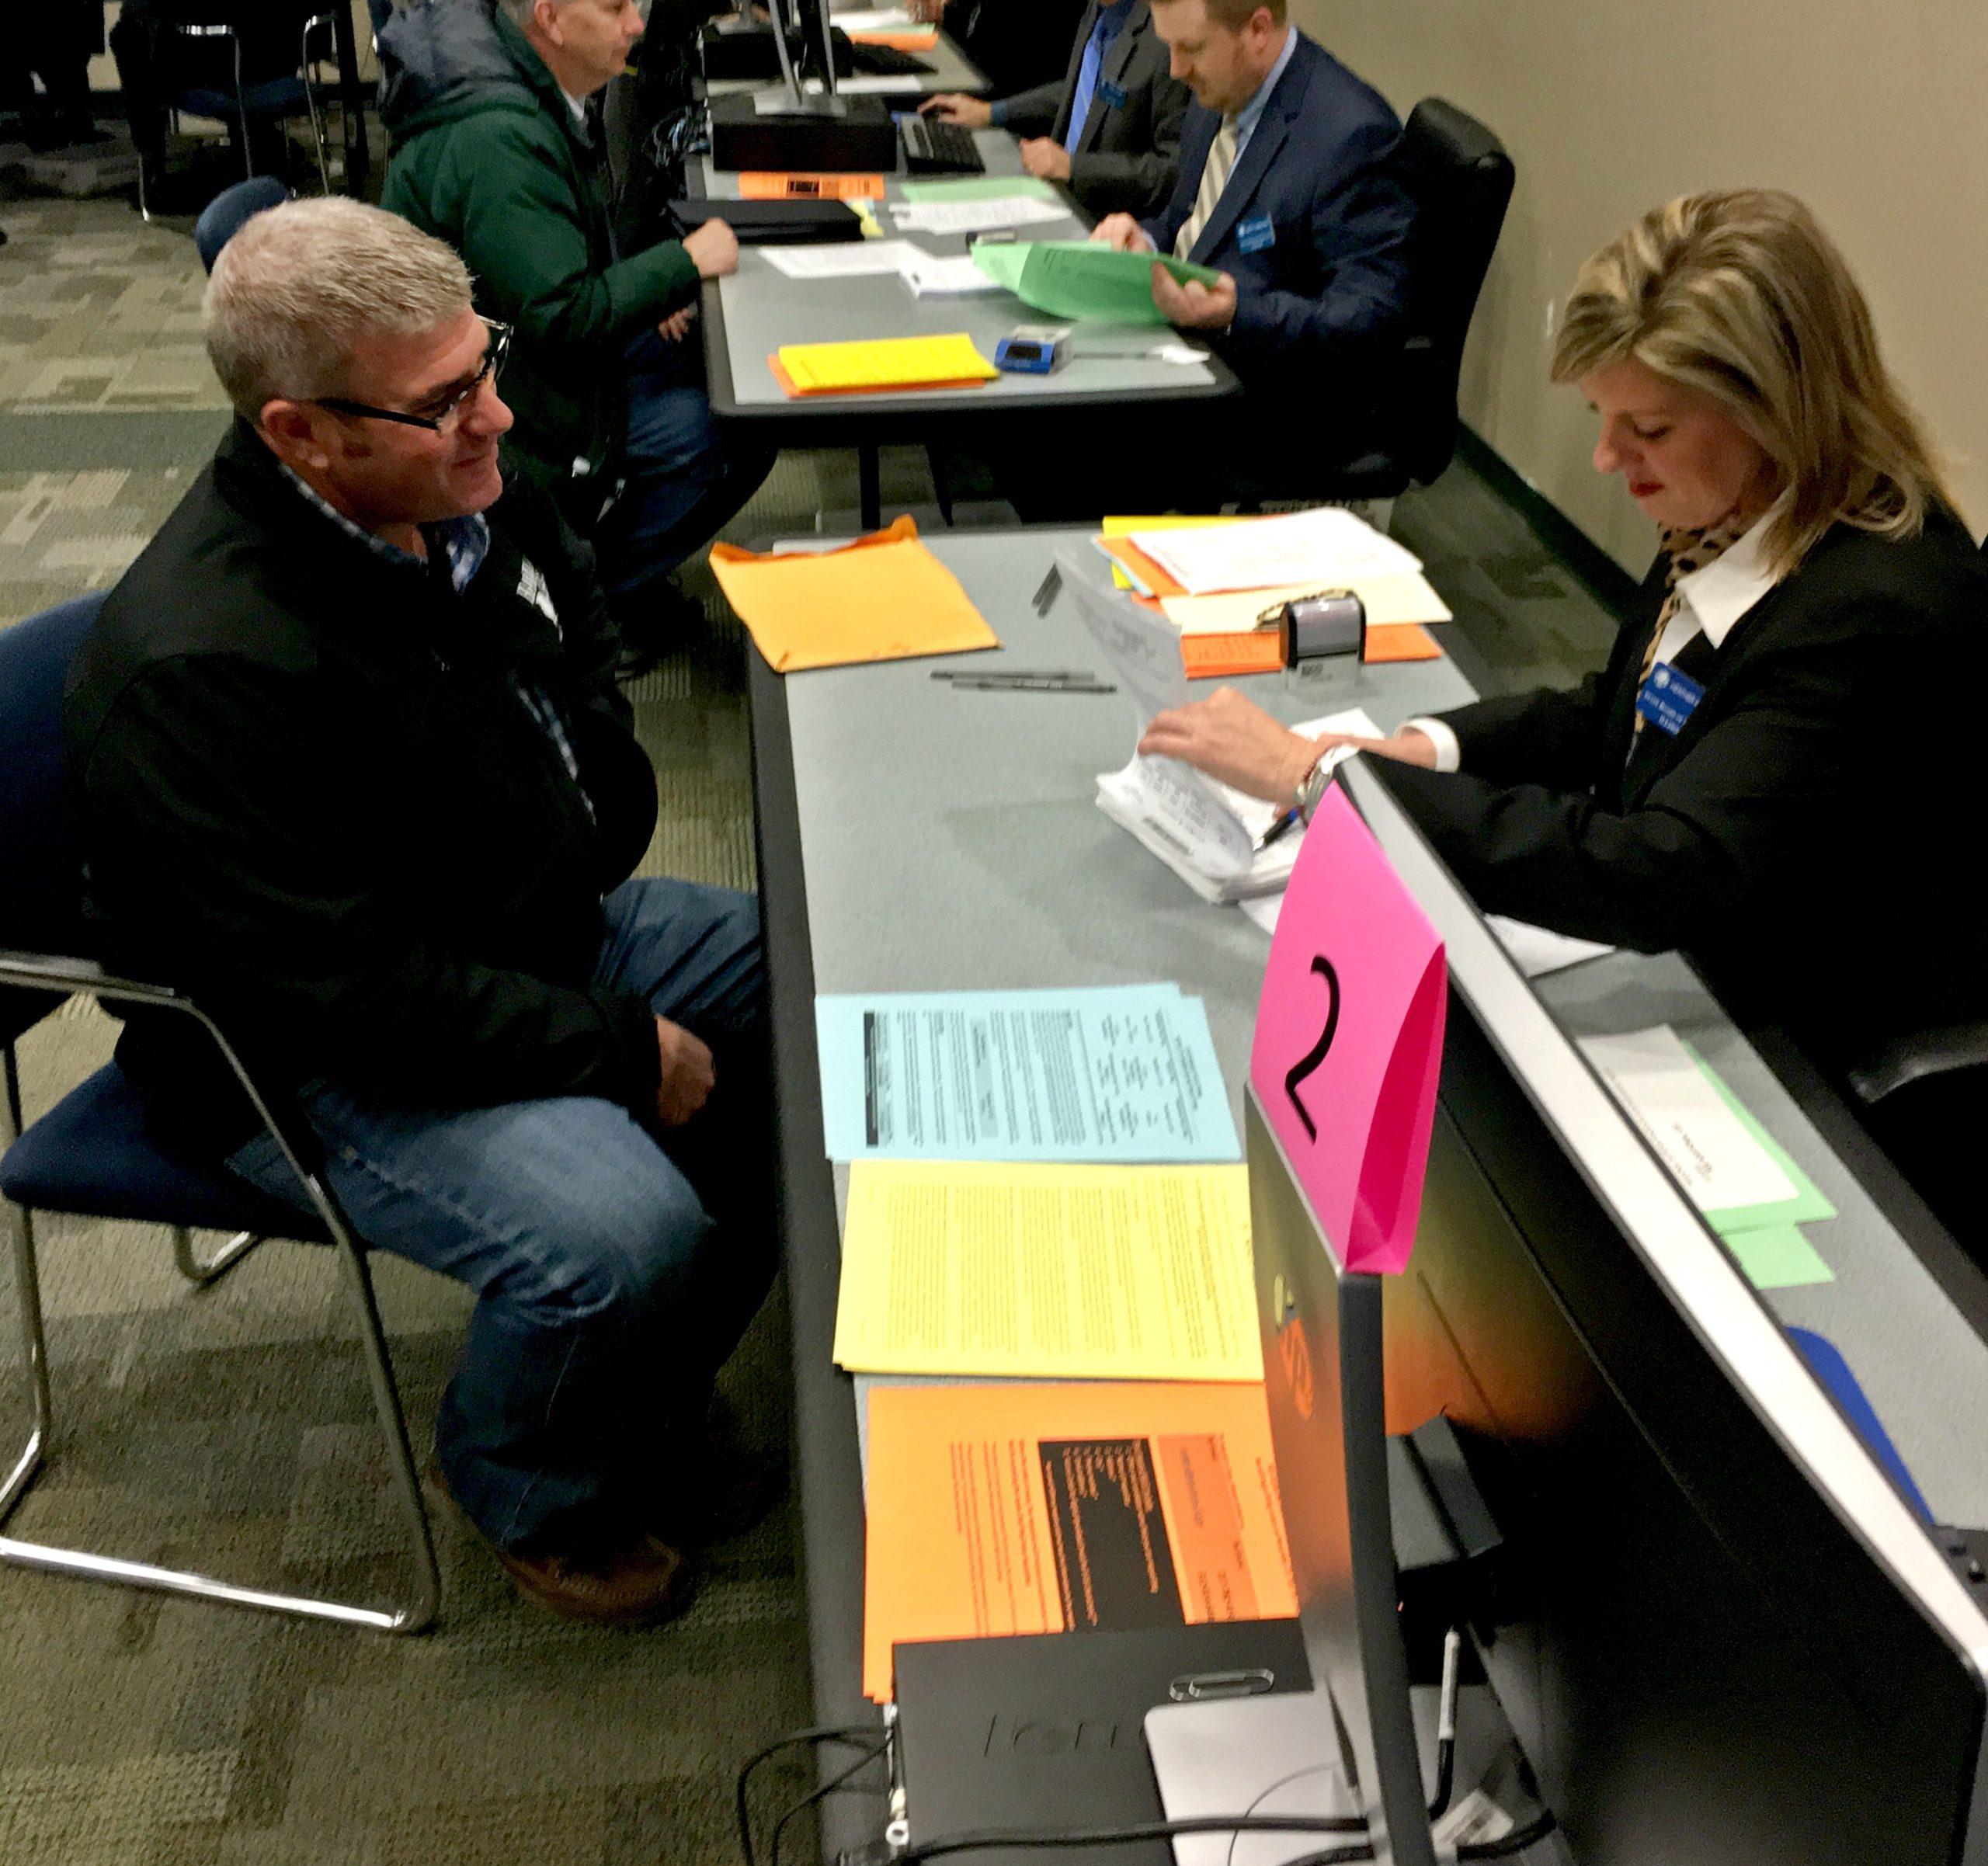 Darren Bailey makes his bid for State Representative official